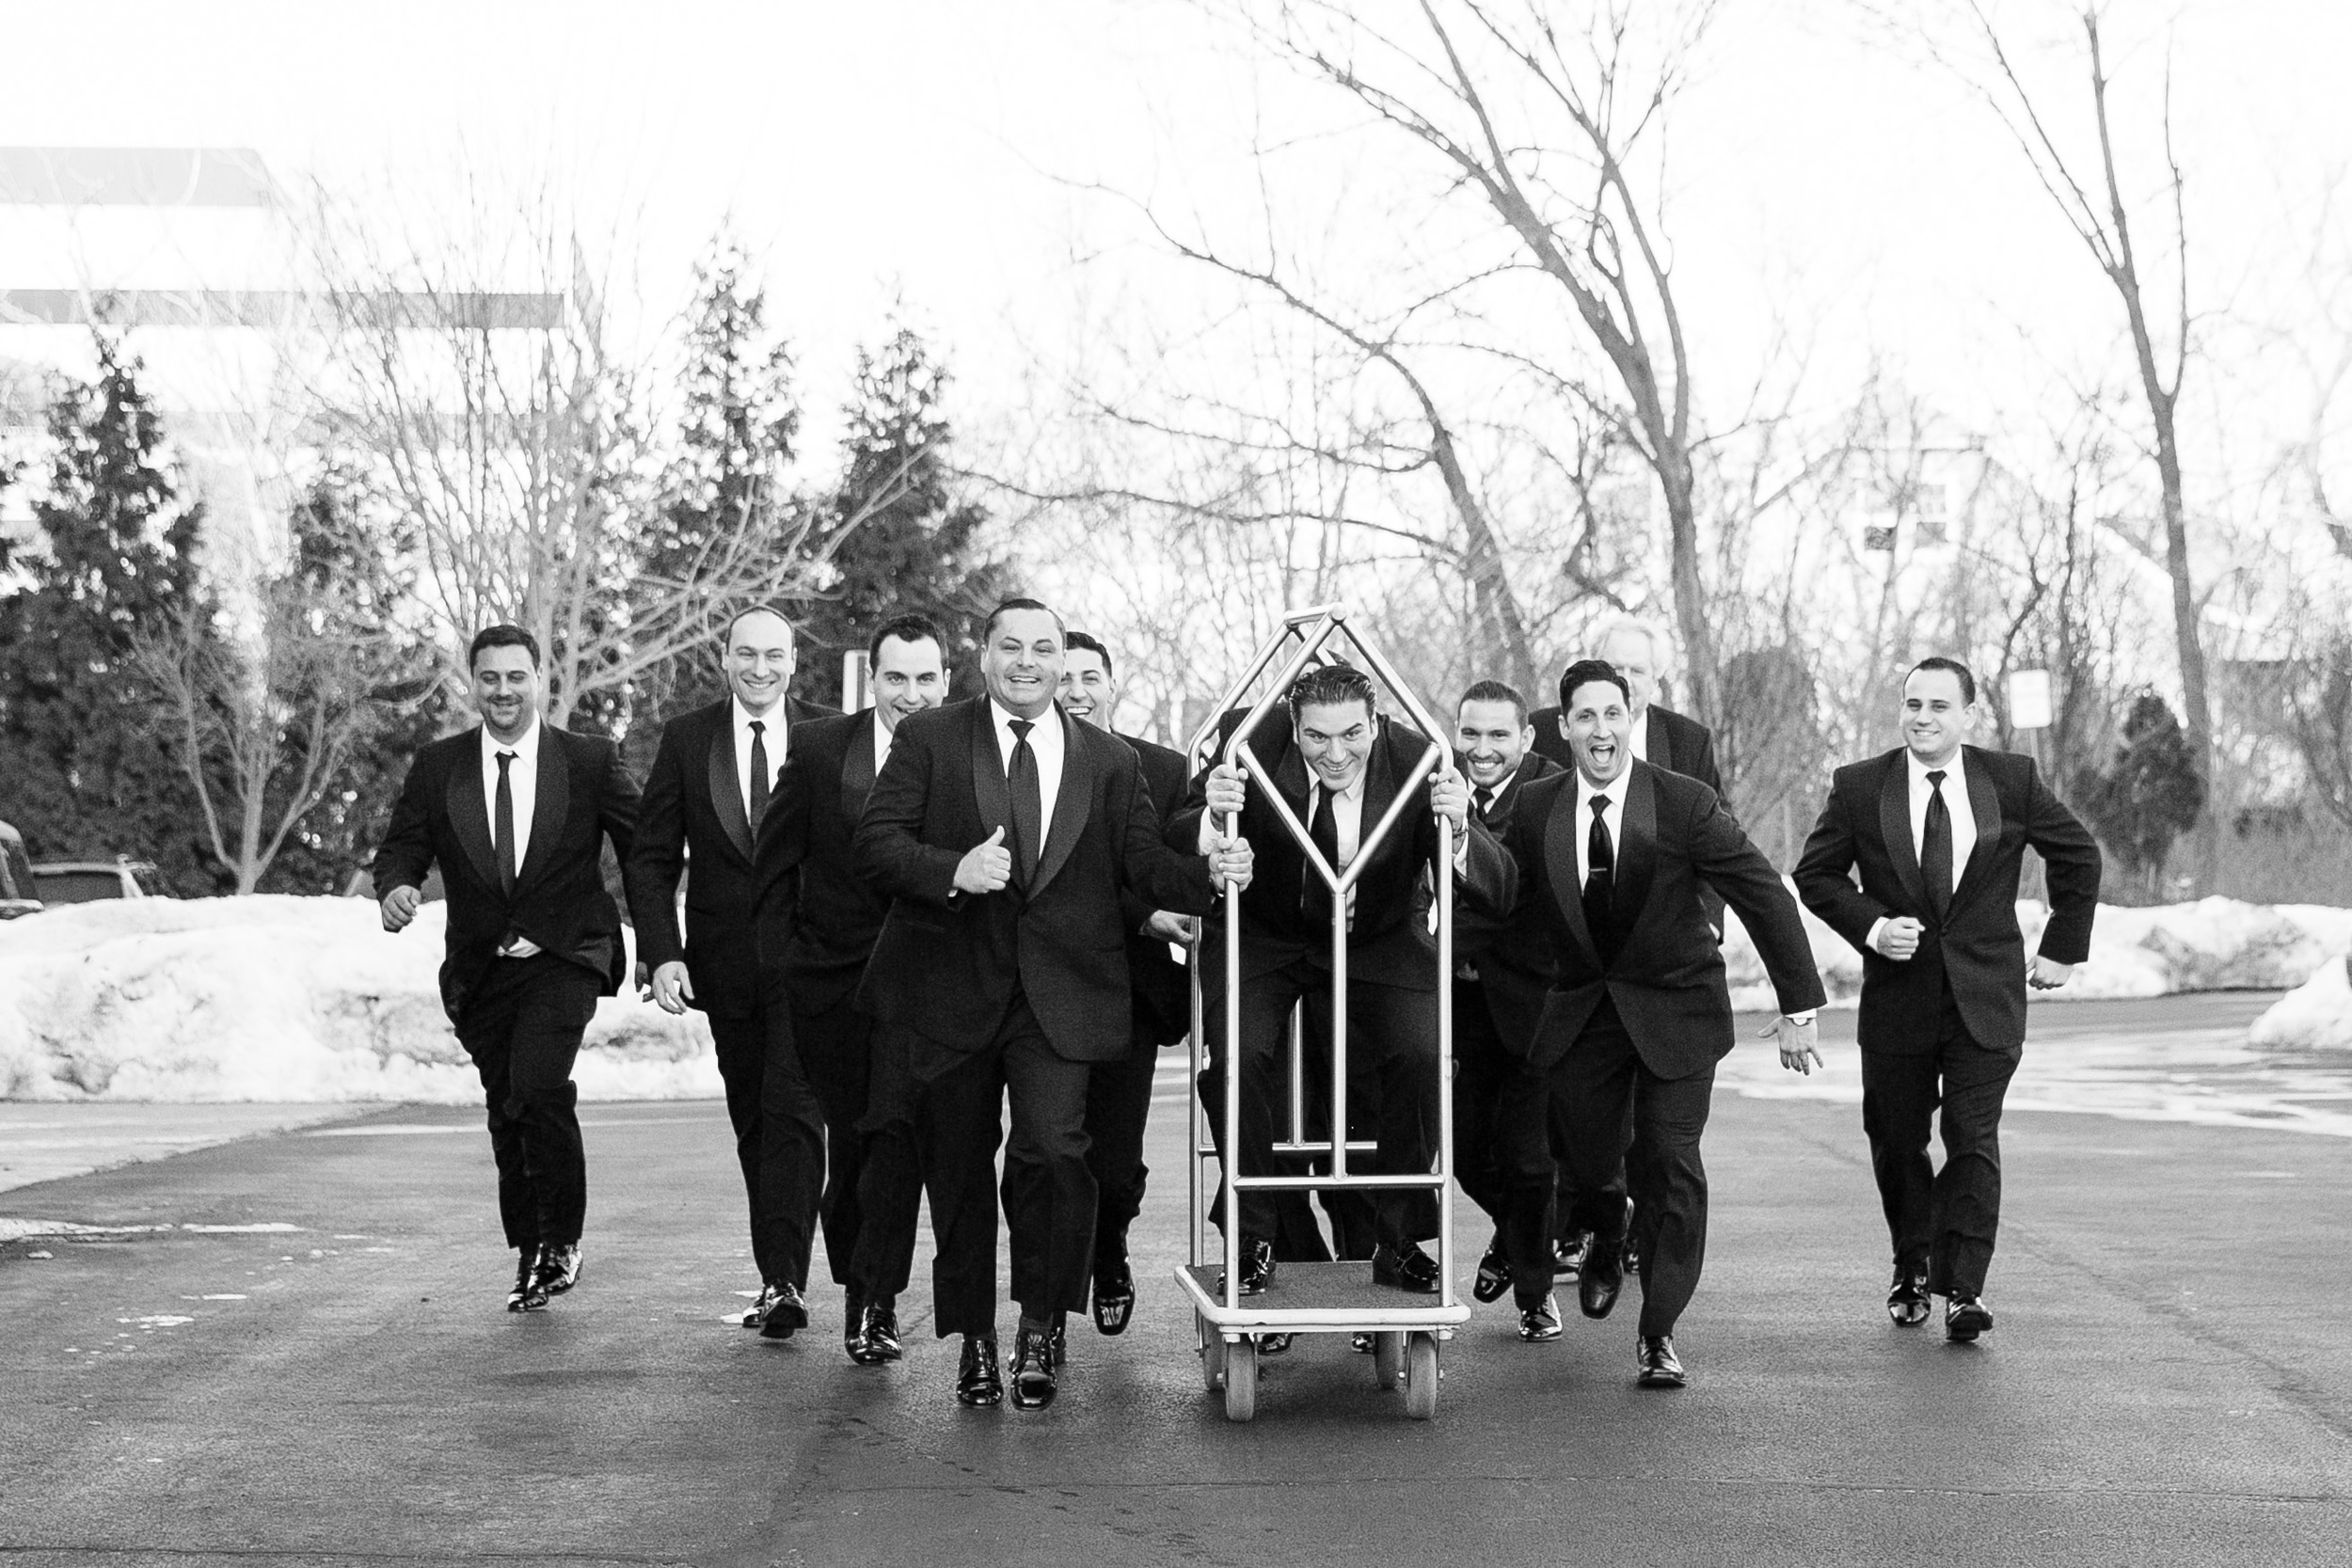 Russian-Jewish-Italian-Luxury-Wedding-The-Palace-at-Somerset-Park-NJ-Documentary-Wedding-Photography.jpg